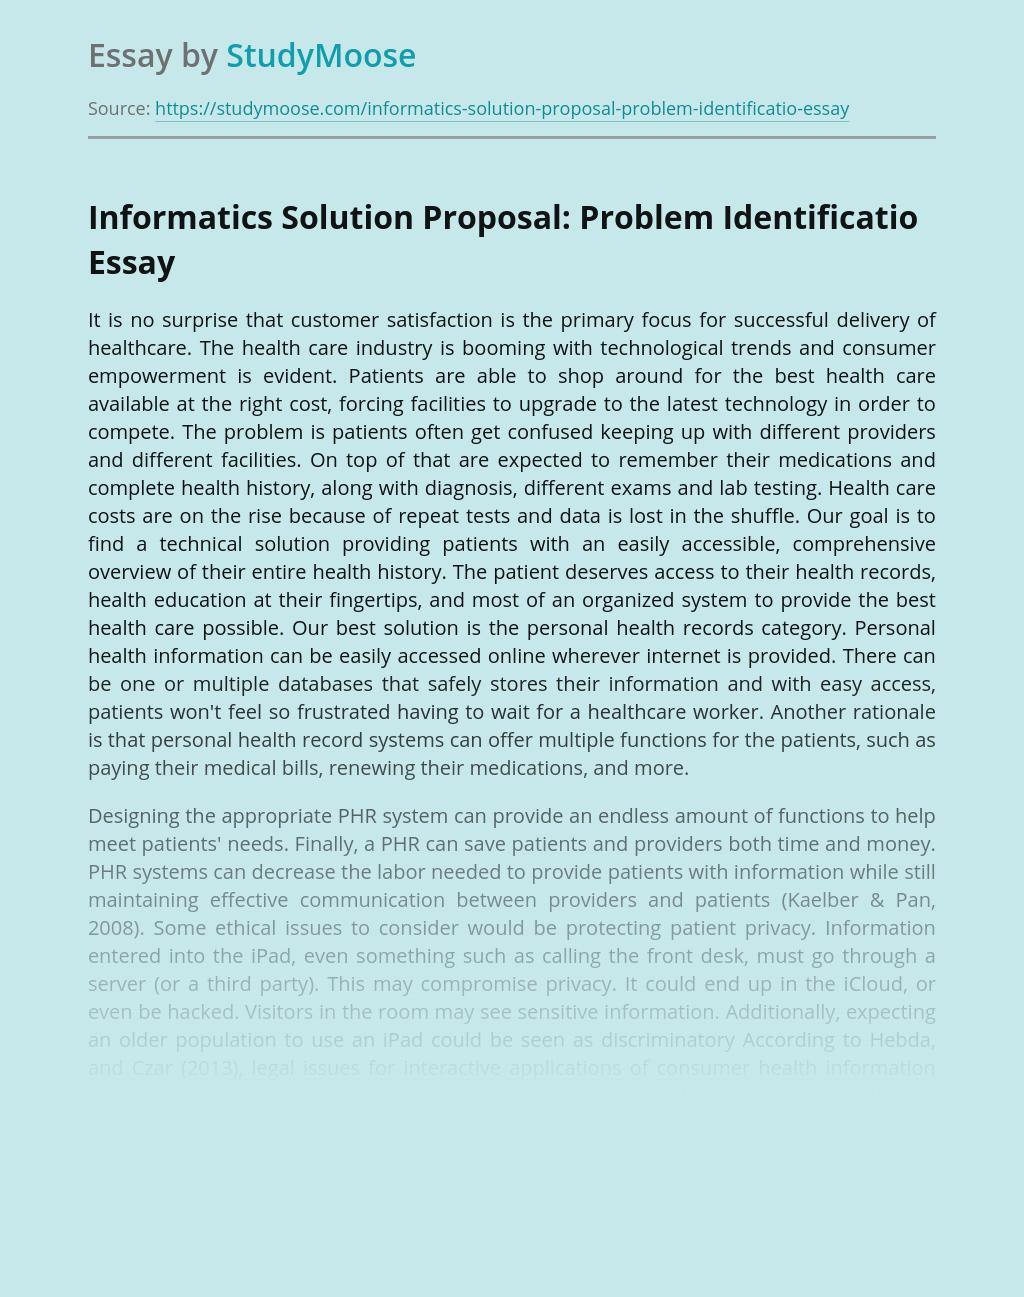 Informatics Solution Proposal: Problem Identificatio